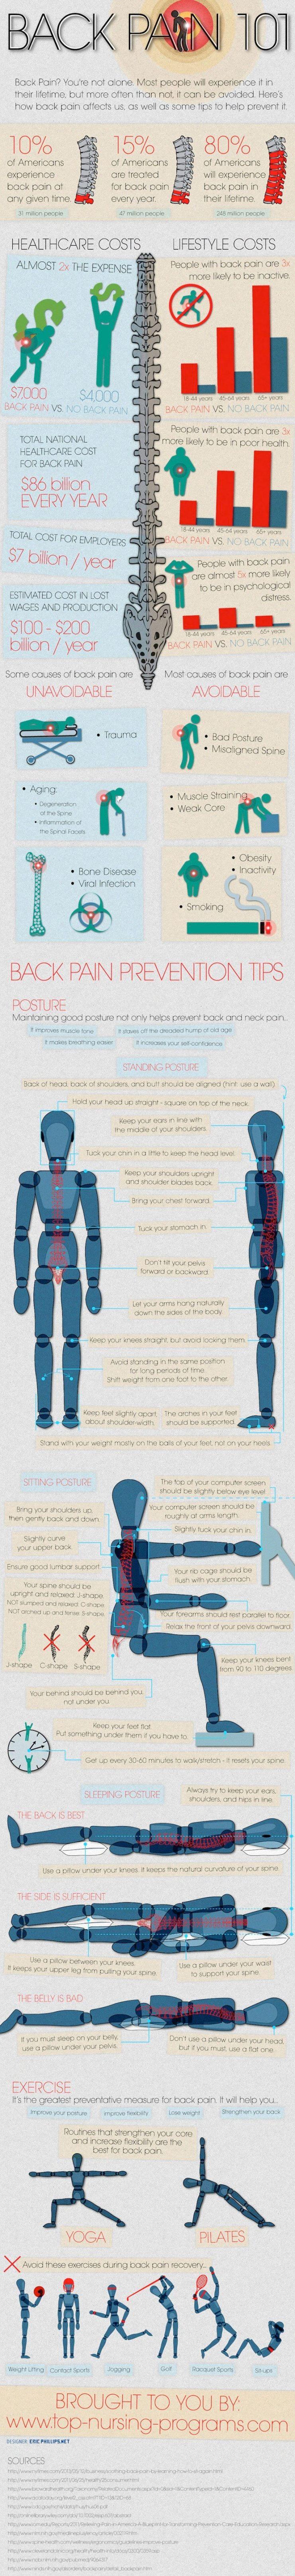 Back Pain 101